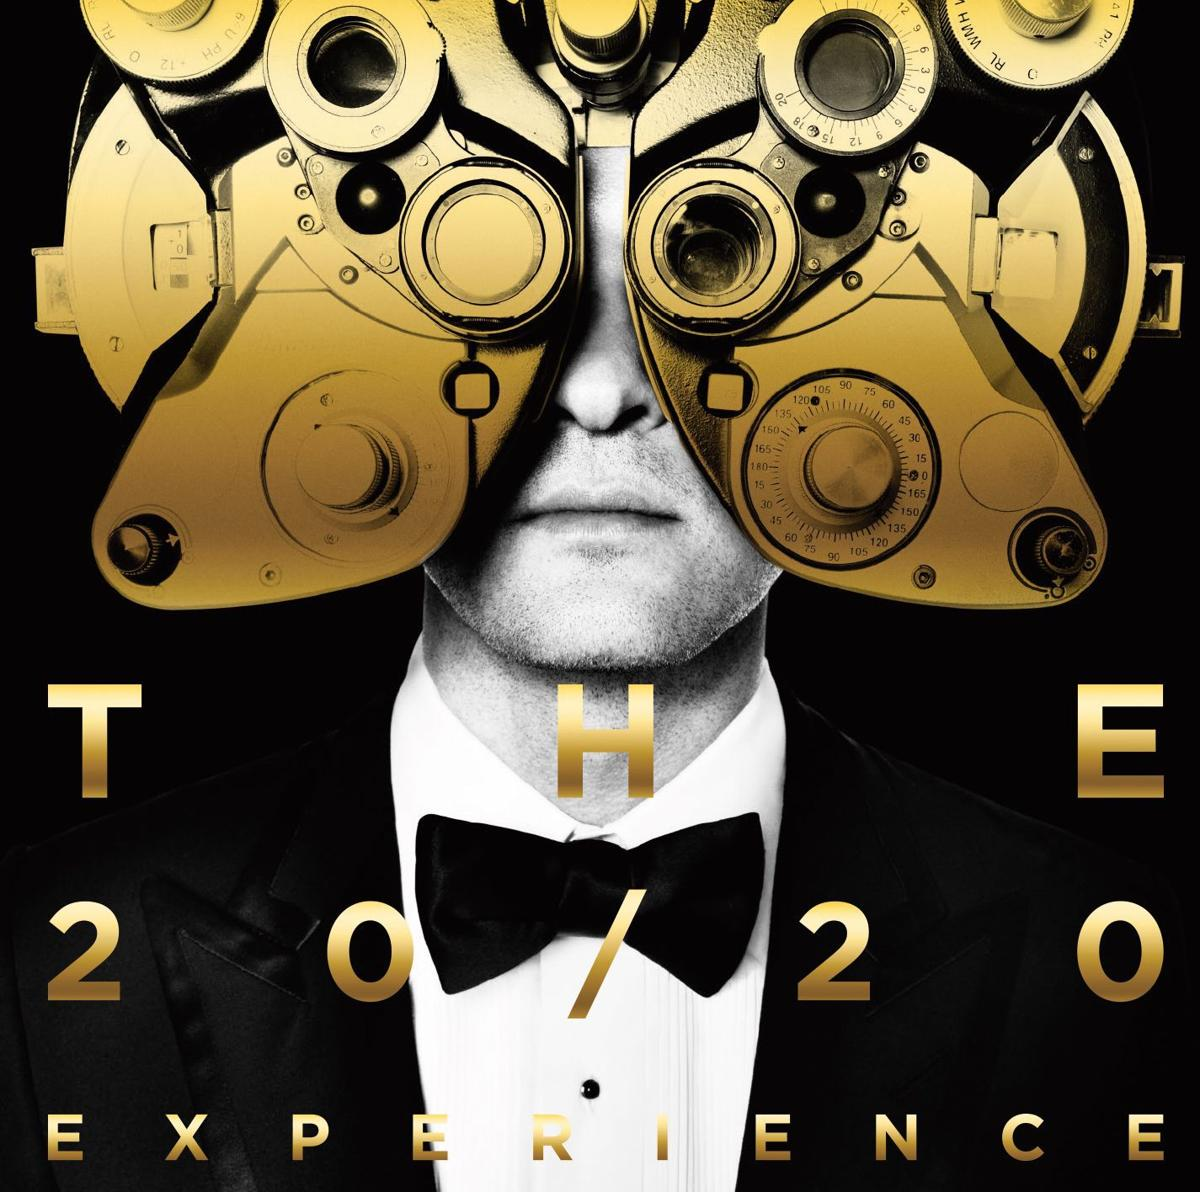 CD reviews: Justin Timberlake, Nelly, Haim